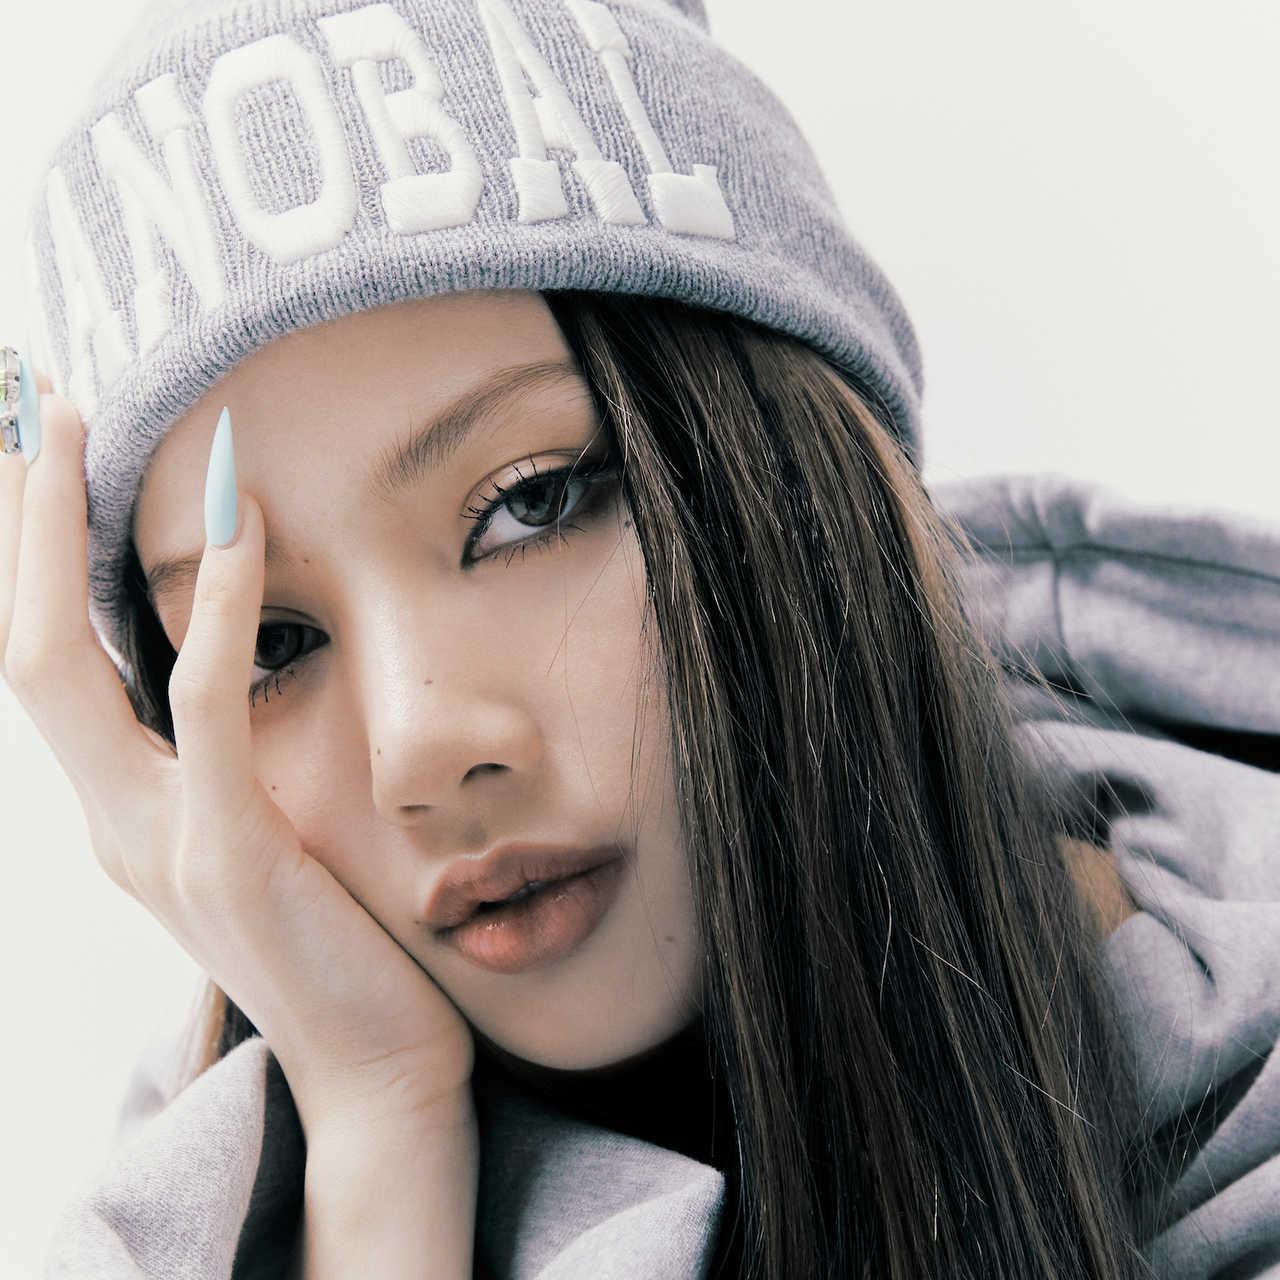 LISA(from. BLACKPINK)ソロデビューシングルが計66ヵ国のiTunesソングチャートでトップ!